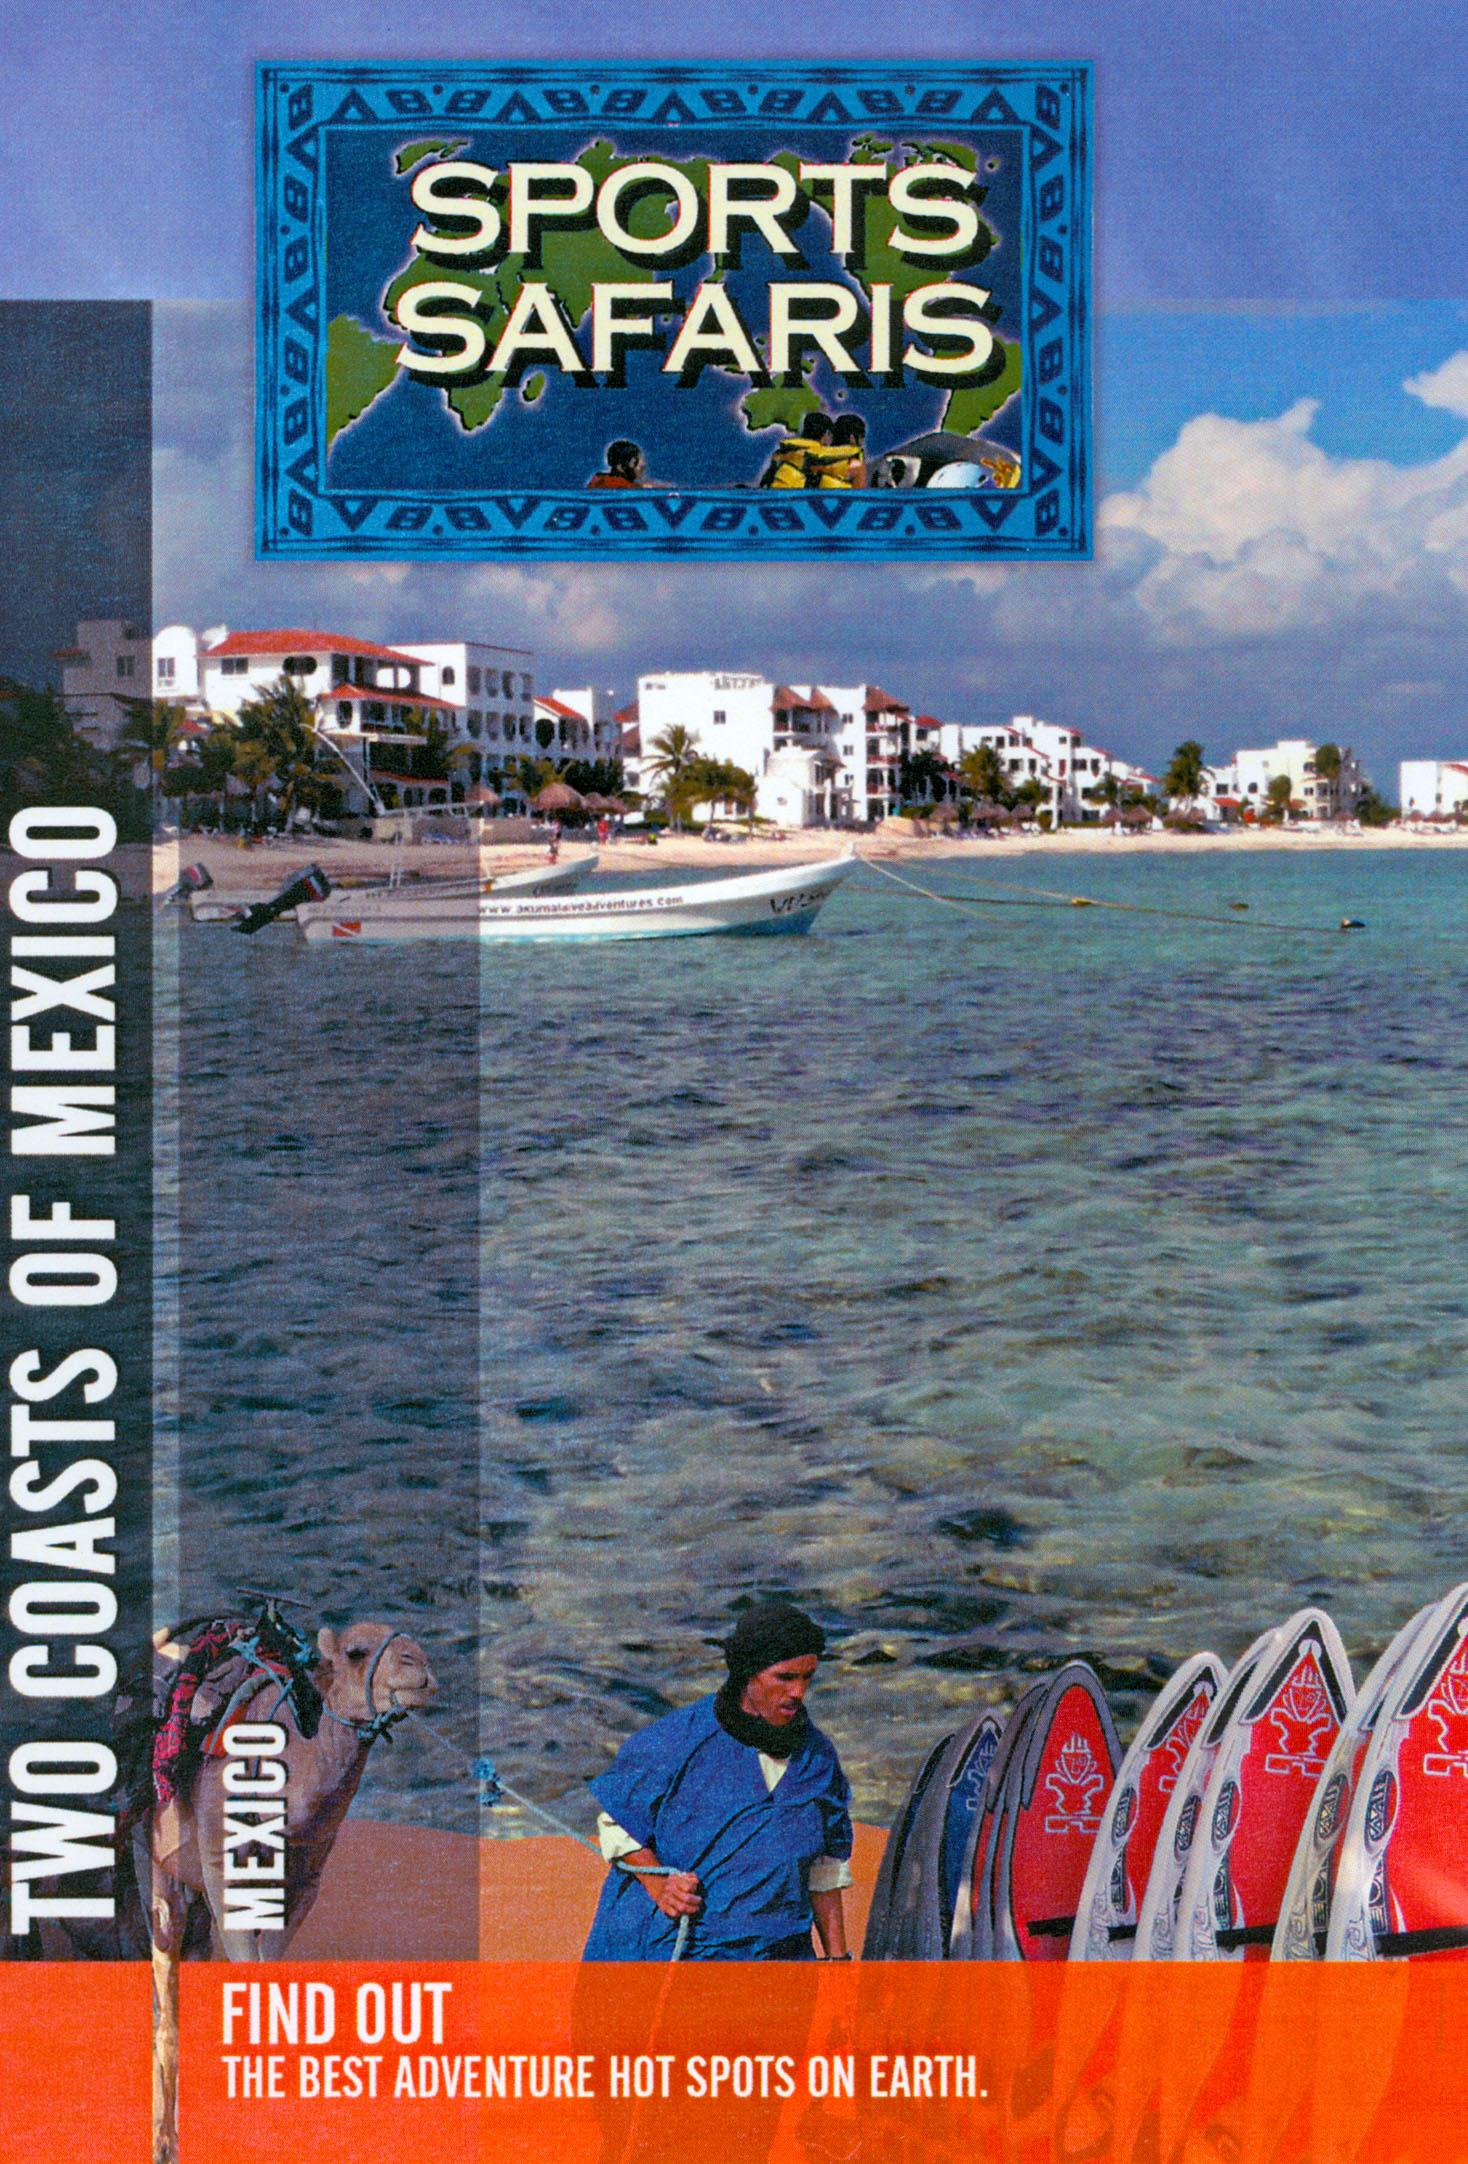 Sports Safaris: Two Coasts of Mexico - Mexico